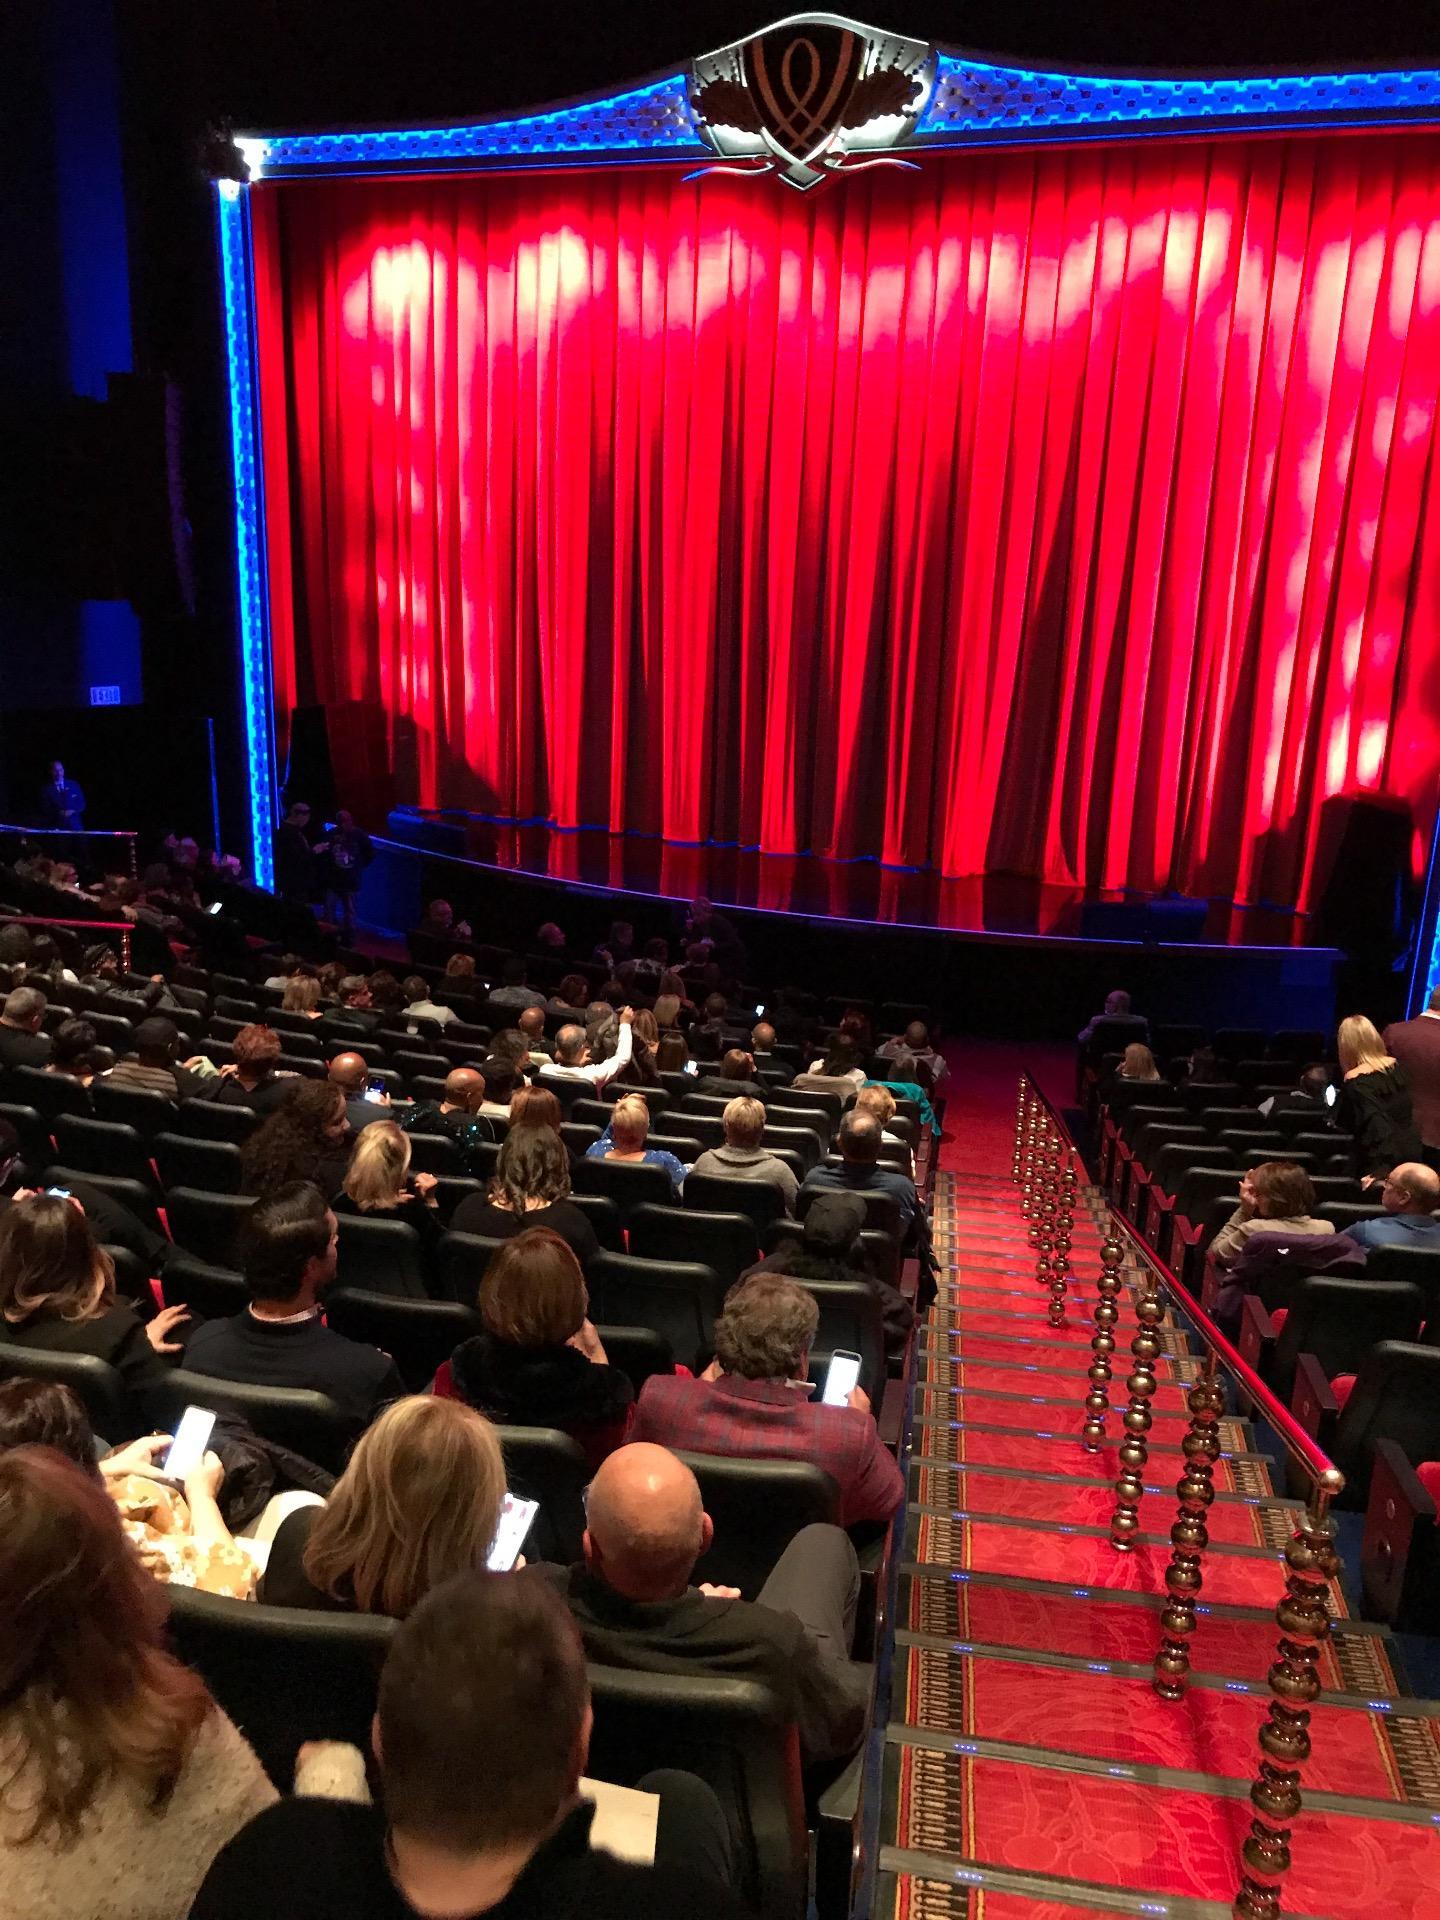 Encore Theatre At Wynn Secção Orch Center Fila S Lugar 101